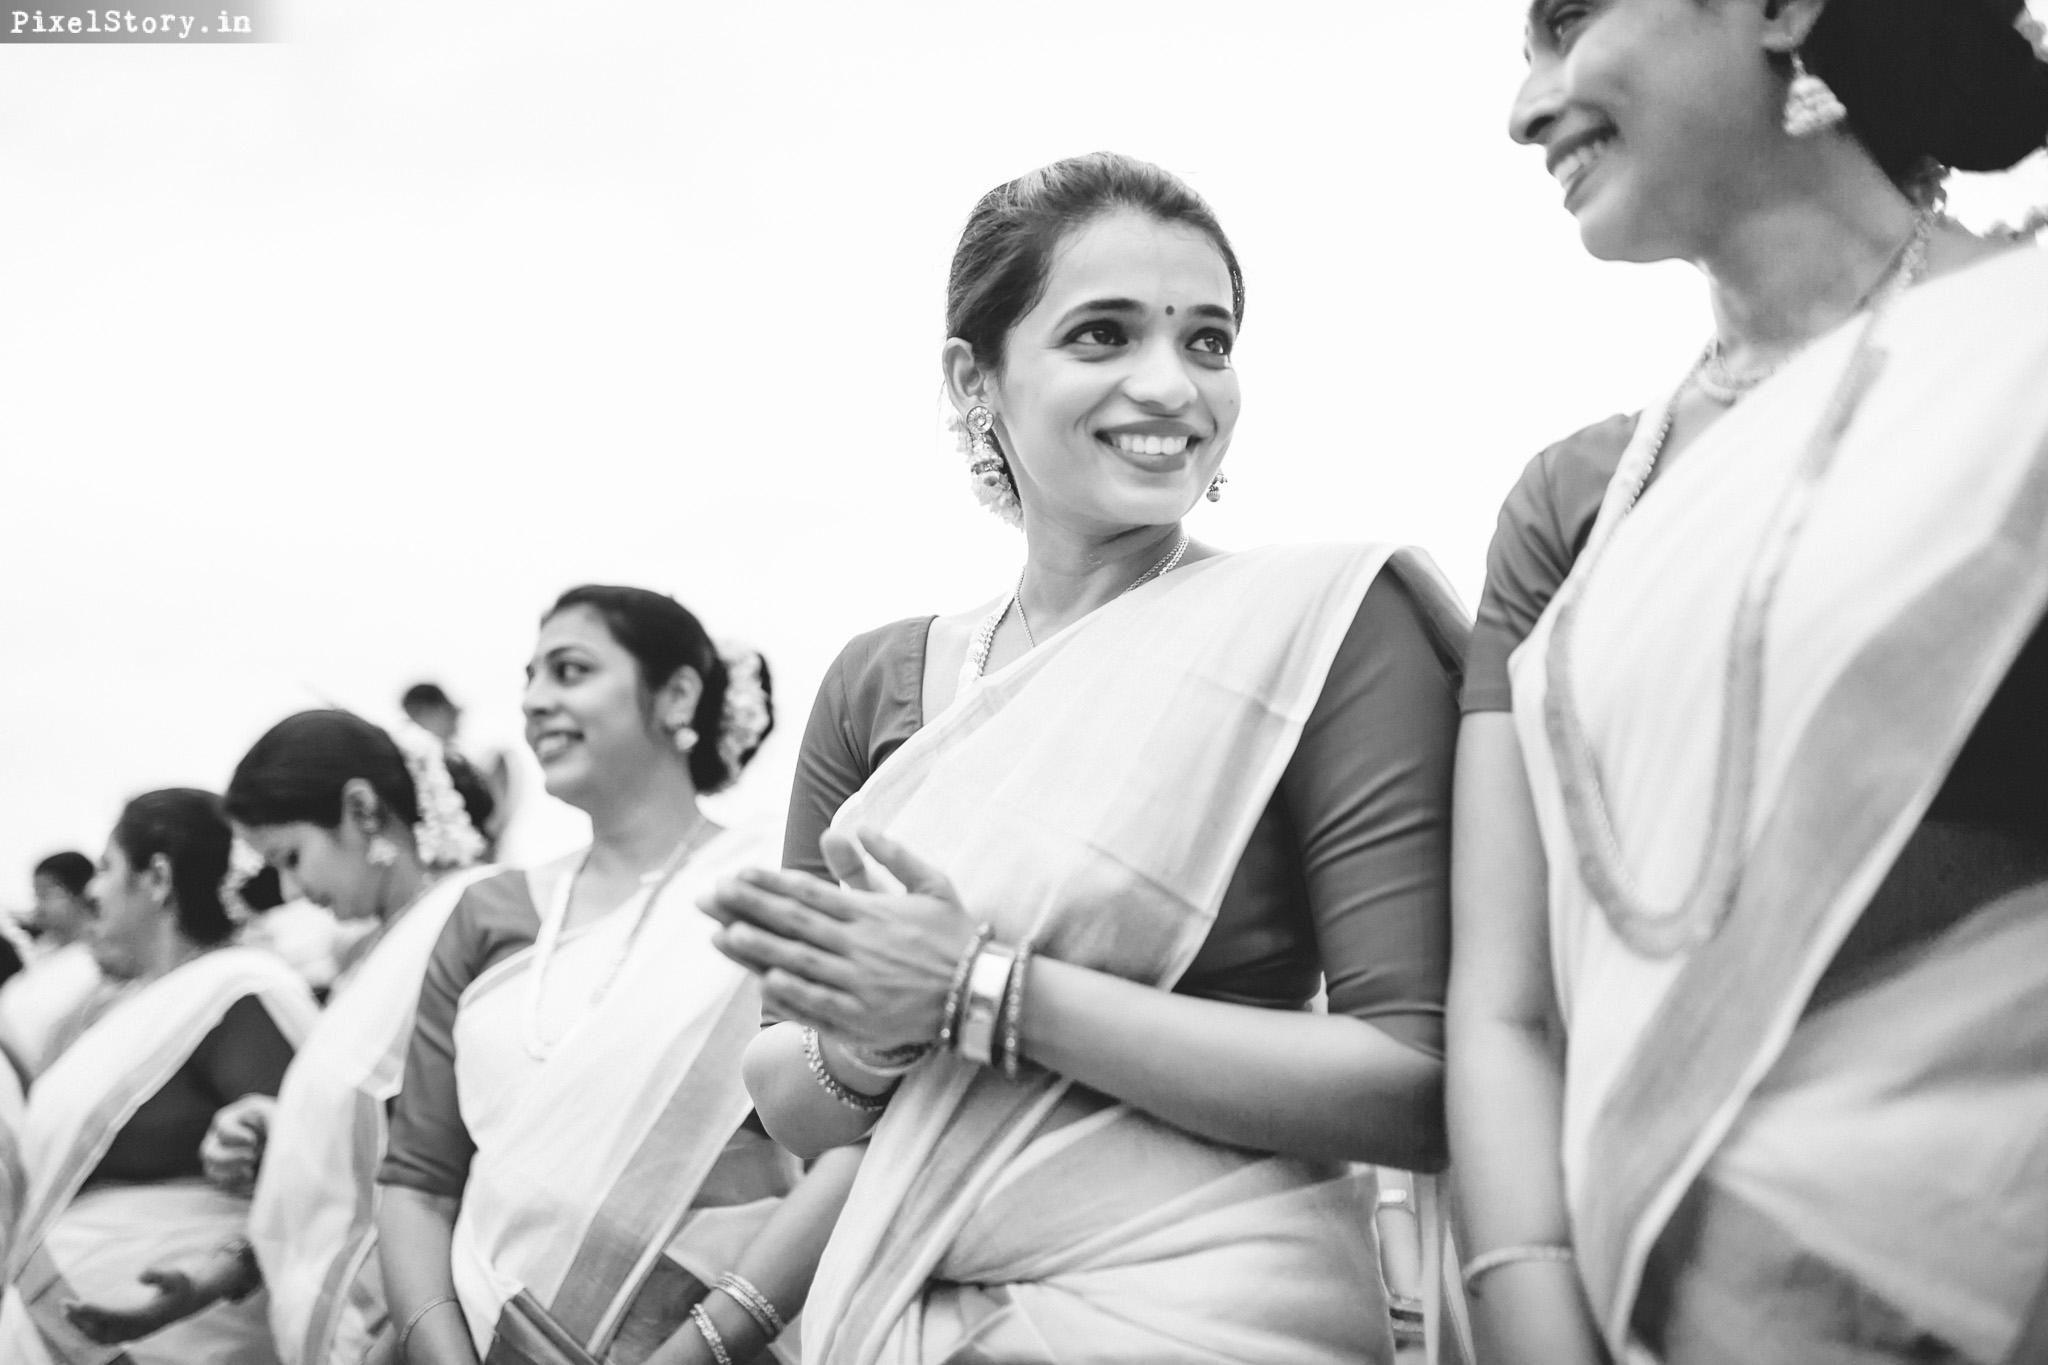 PixelStory-Ganesh-Utsav-2017-195.jpg